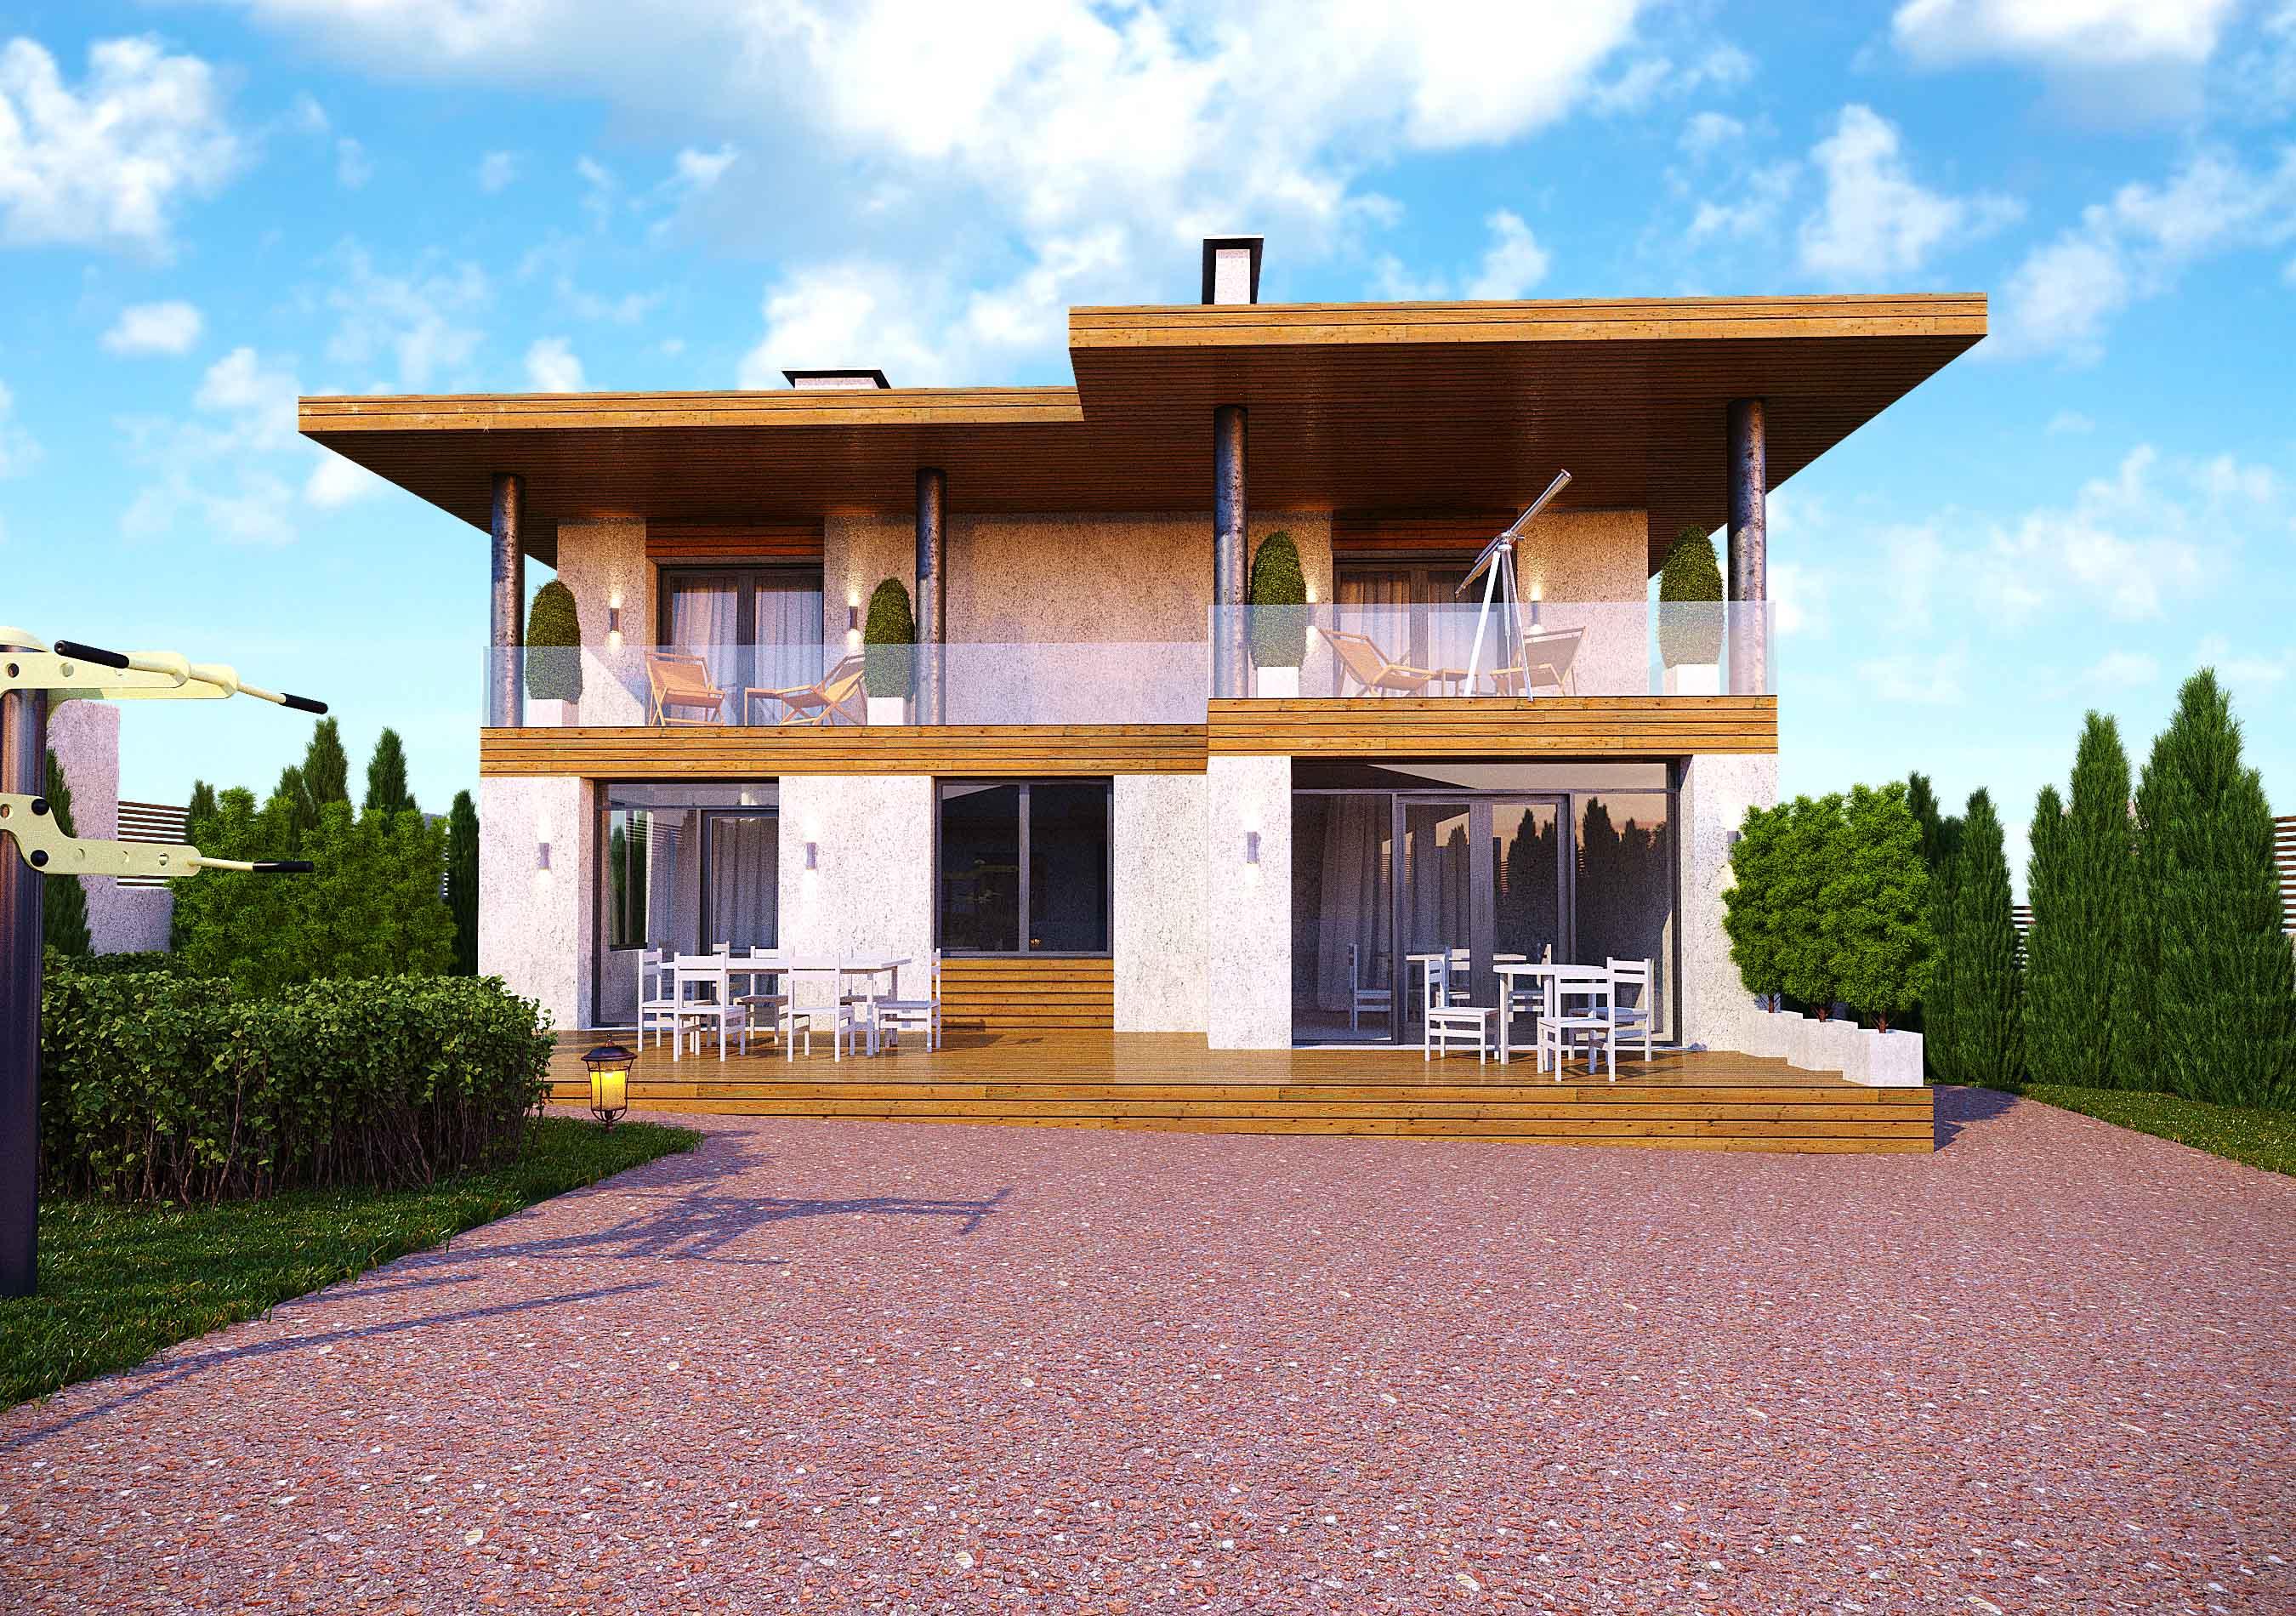 Проект и визуализация частного дома г. Ровно